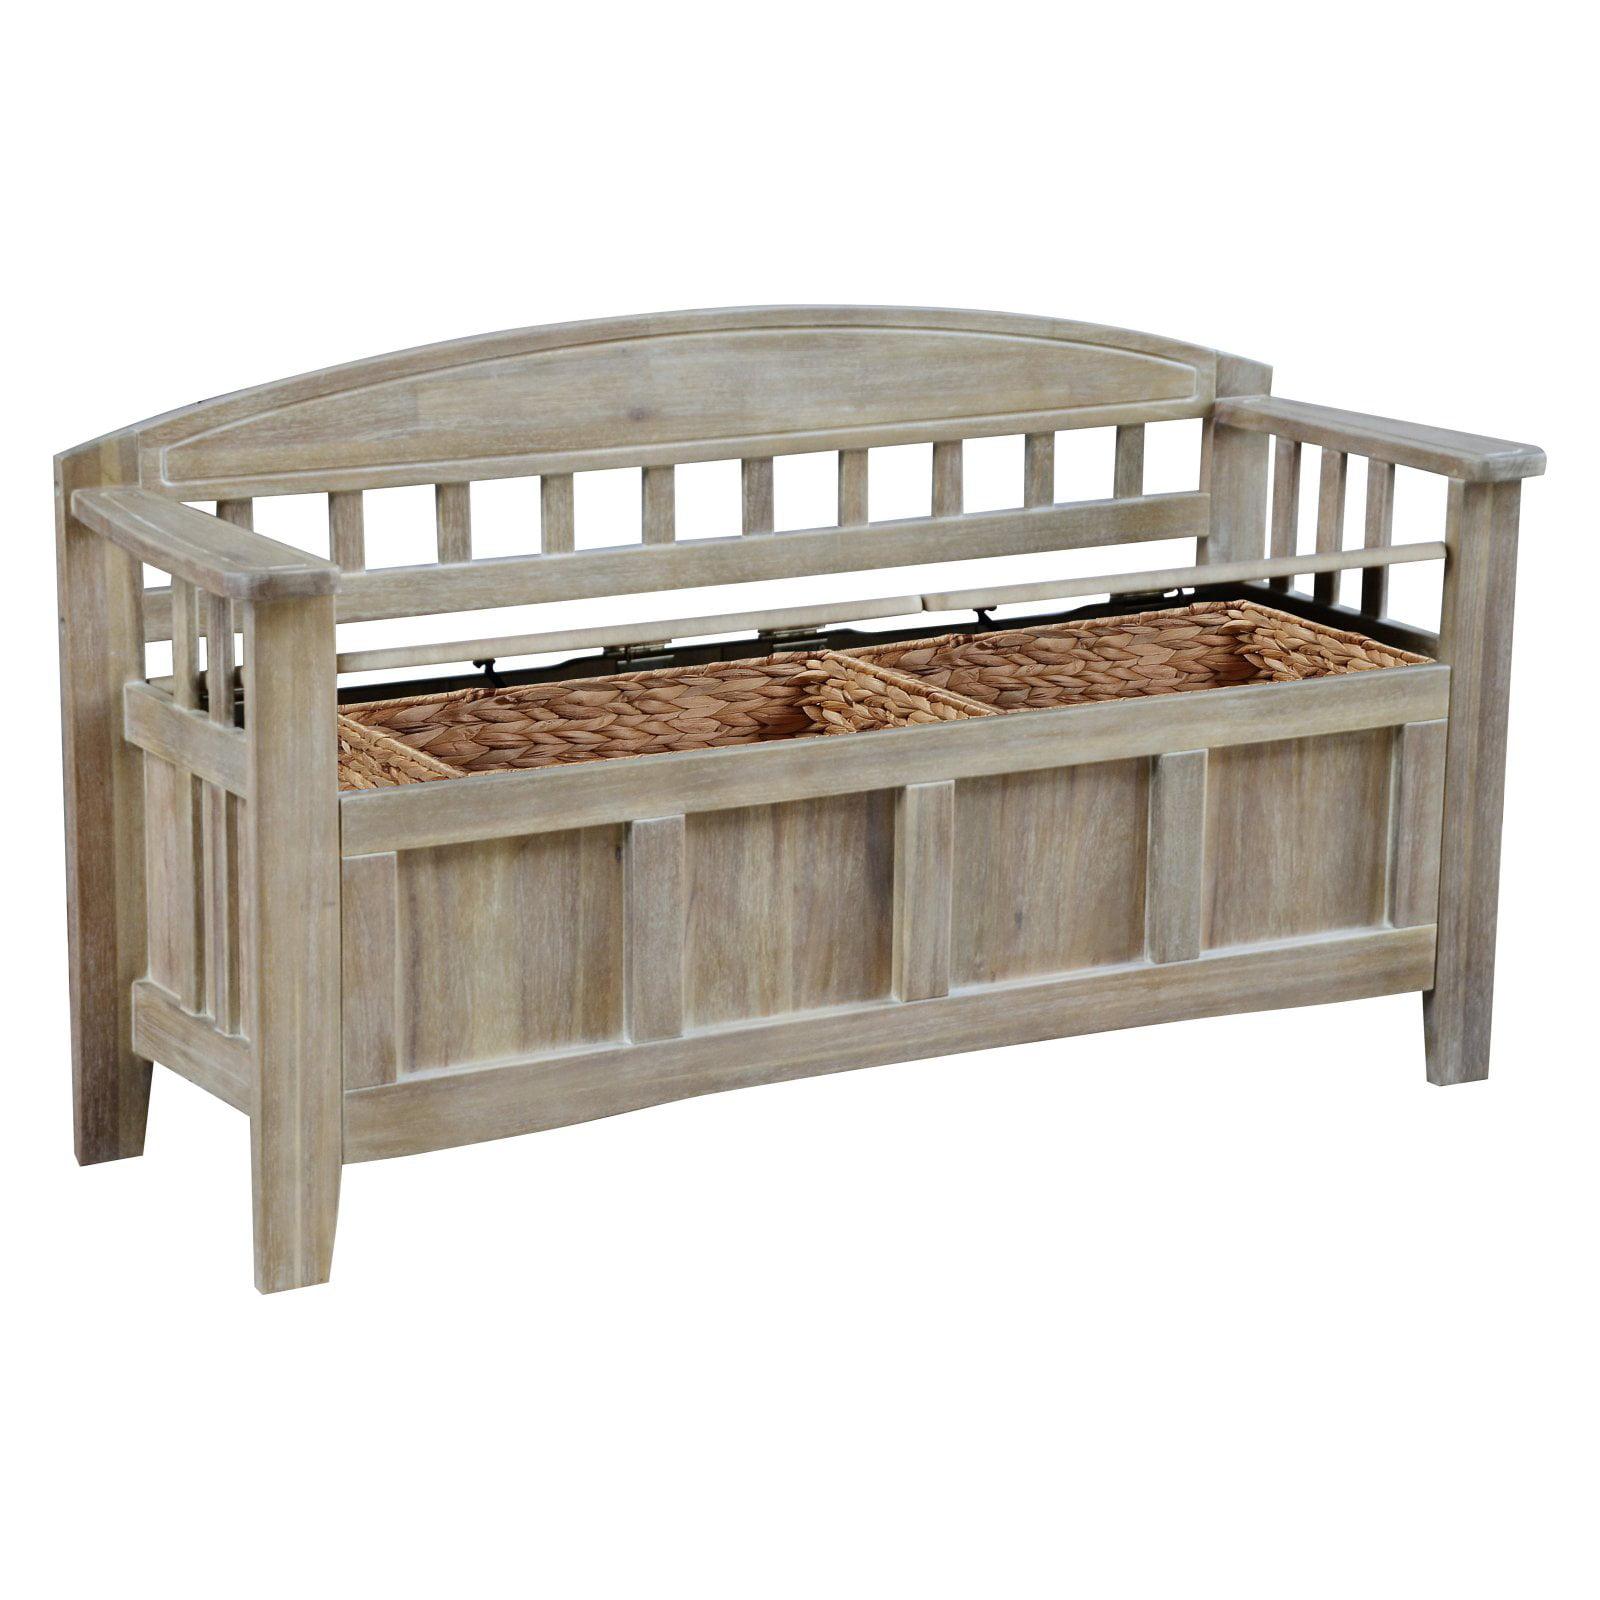 Linon Aria Storage Bench, Natural Wash, Ample Interior Storage Space